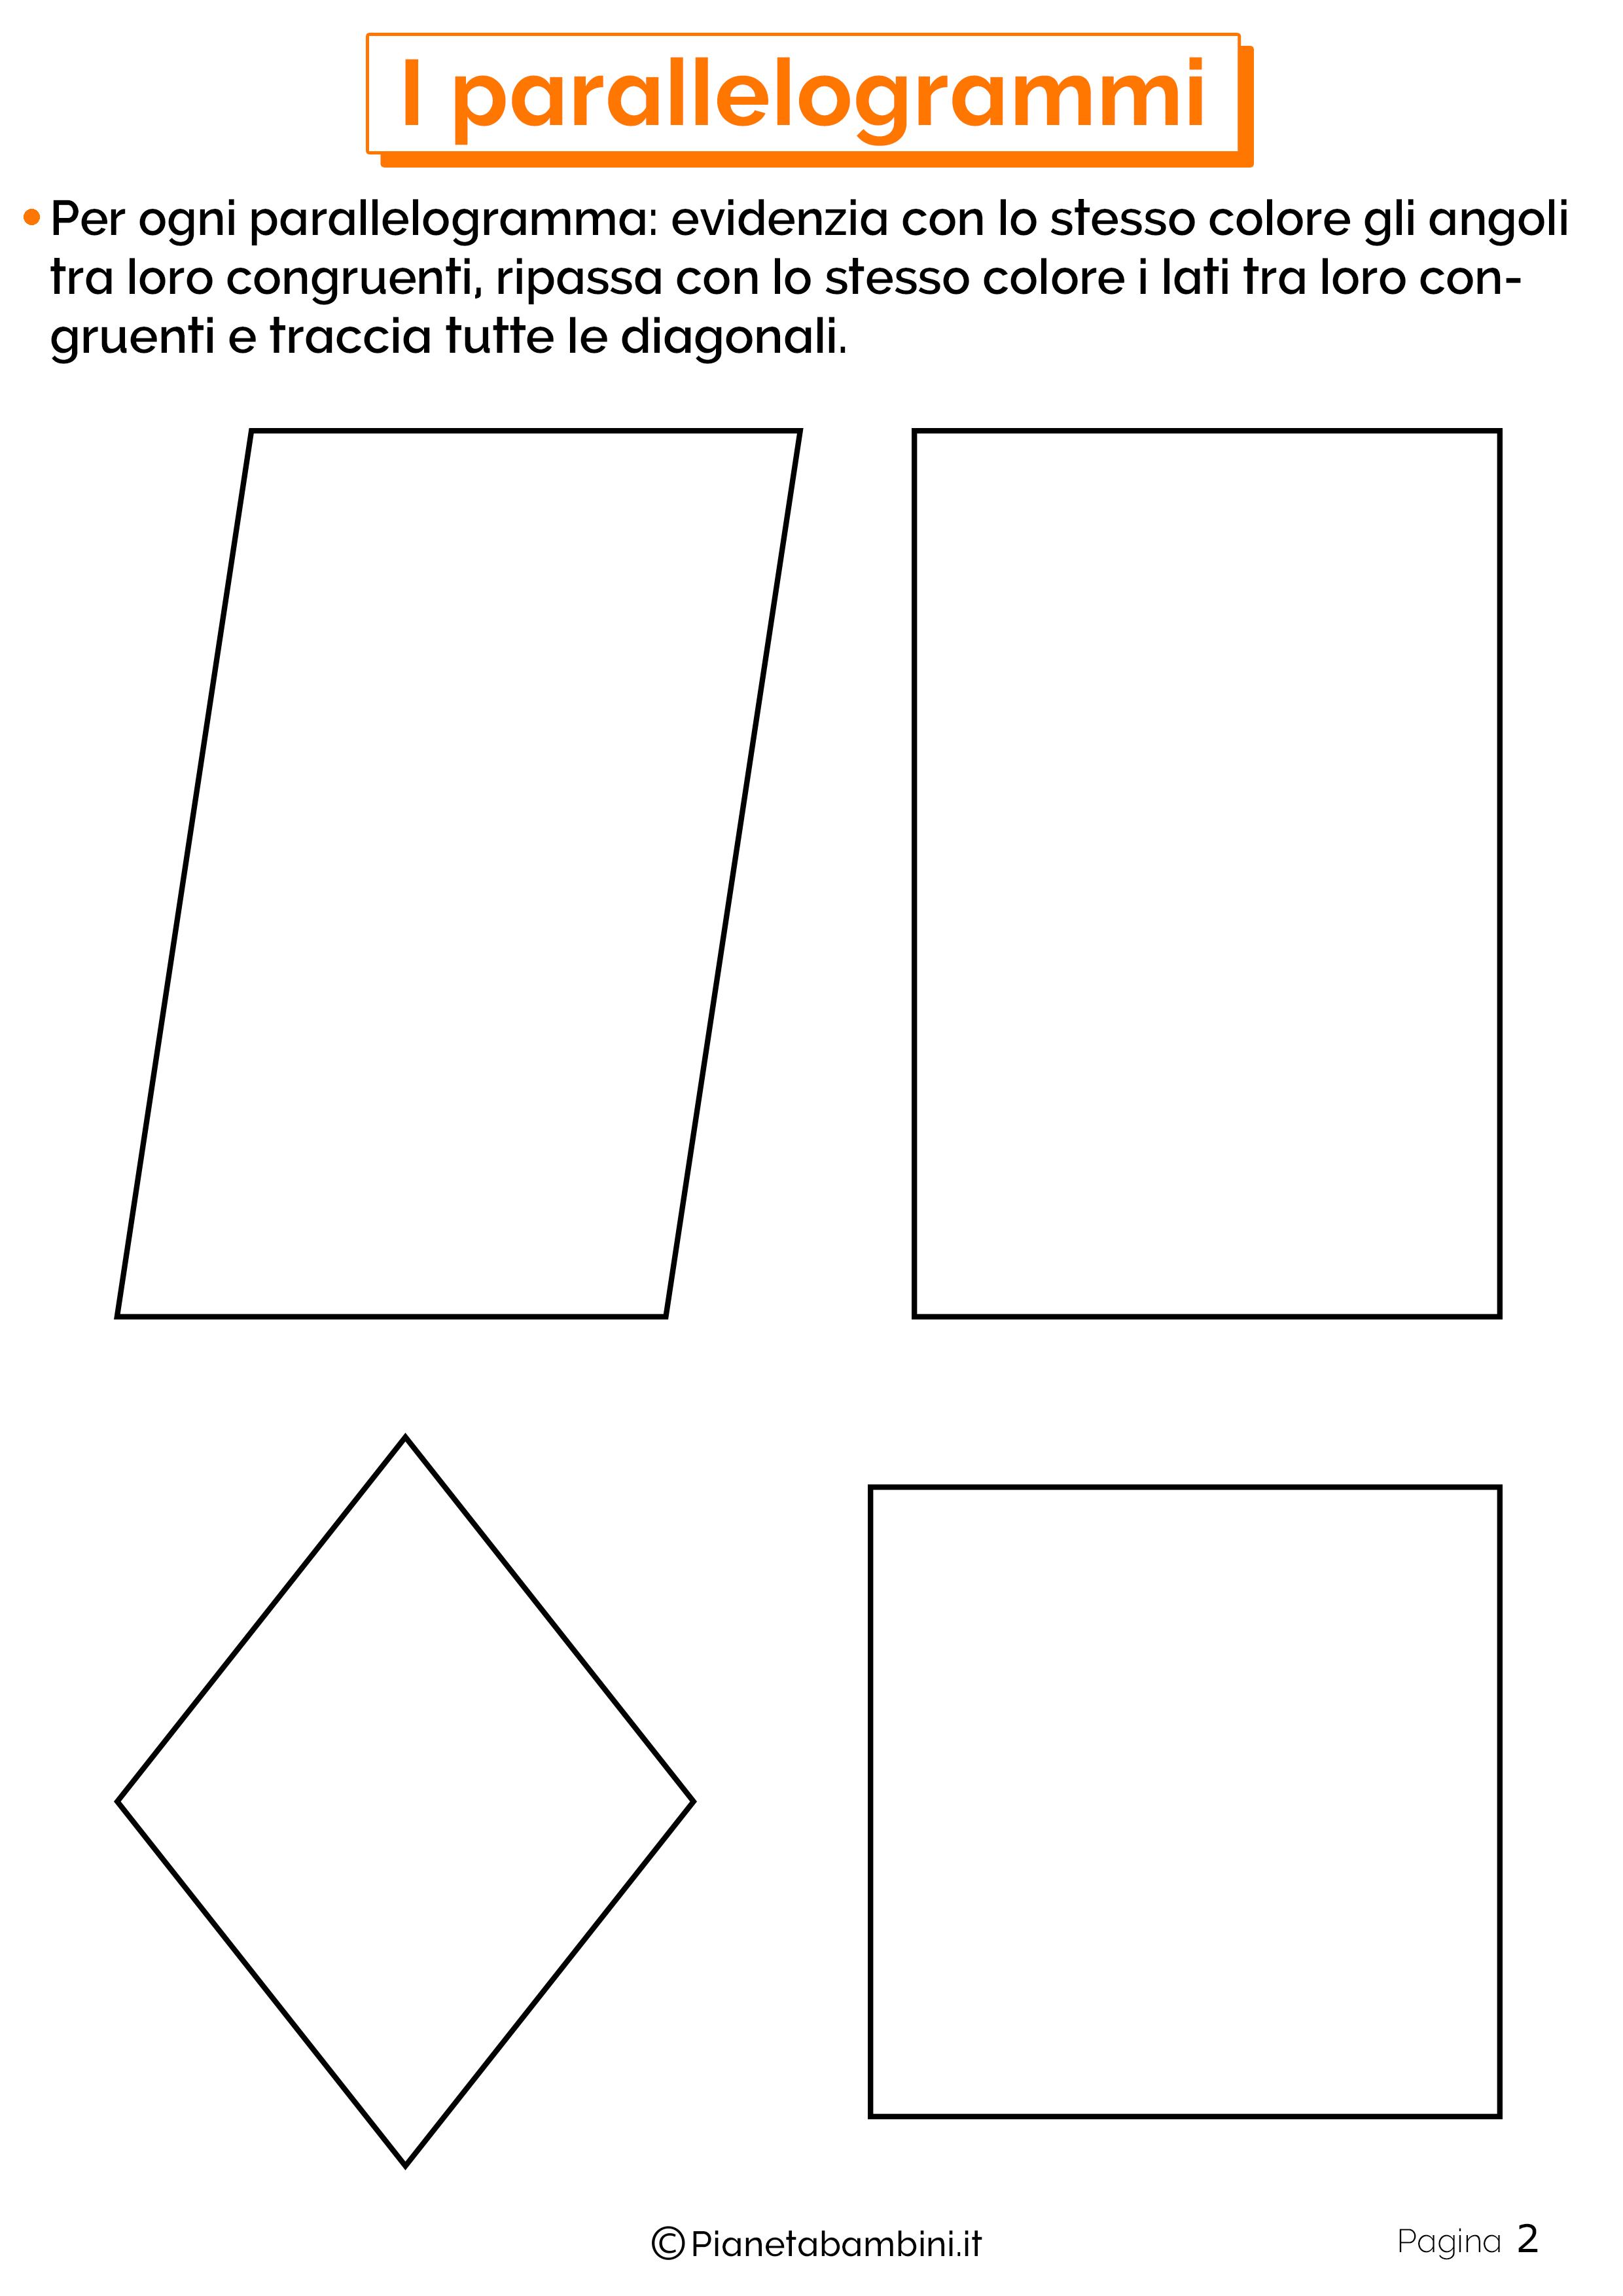 Schede didattiche sui parallelogrammi 2